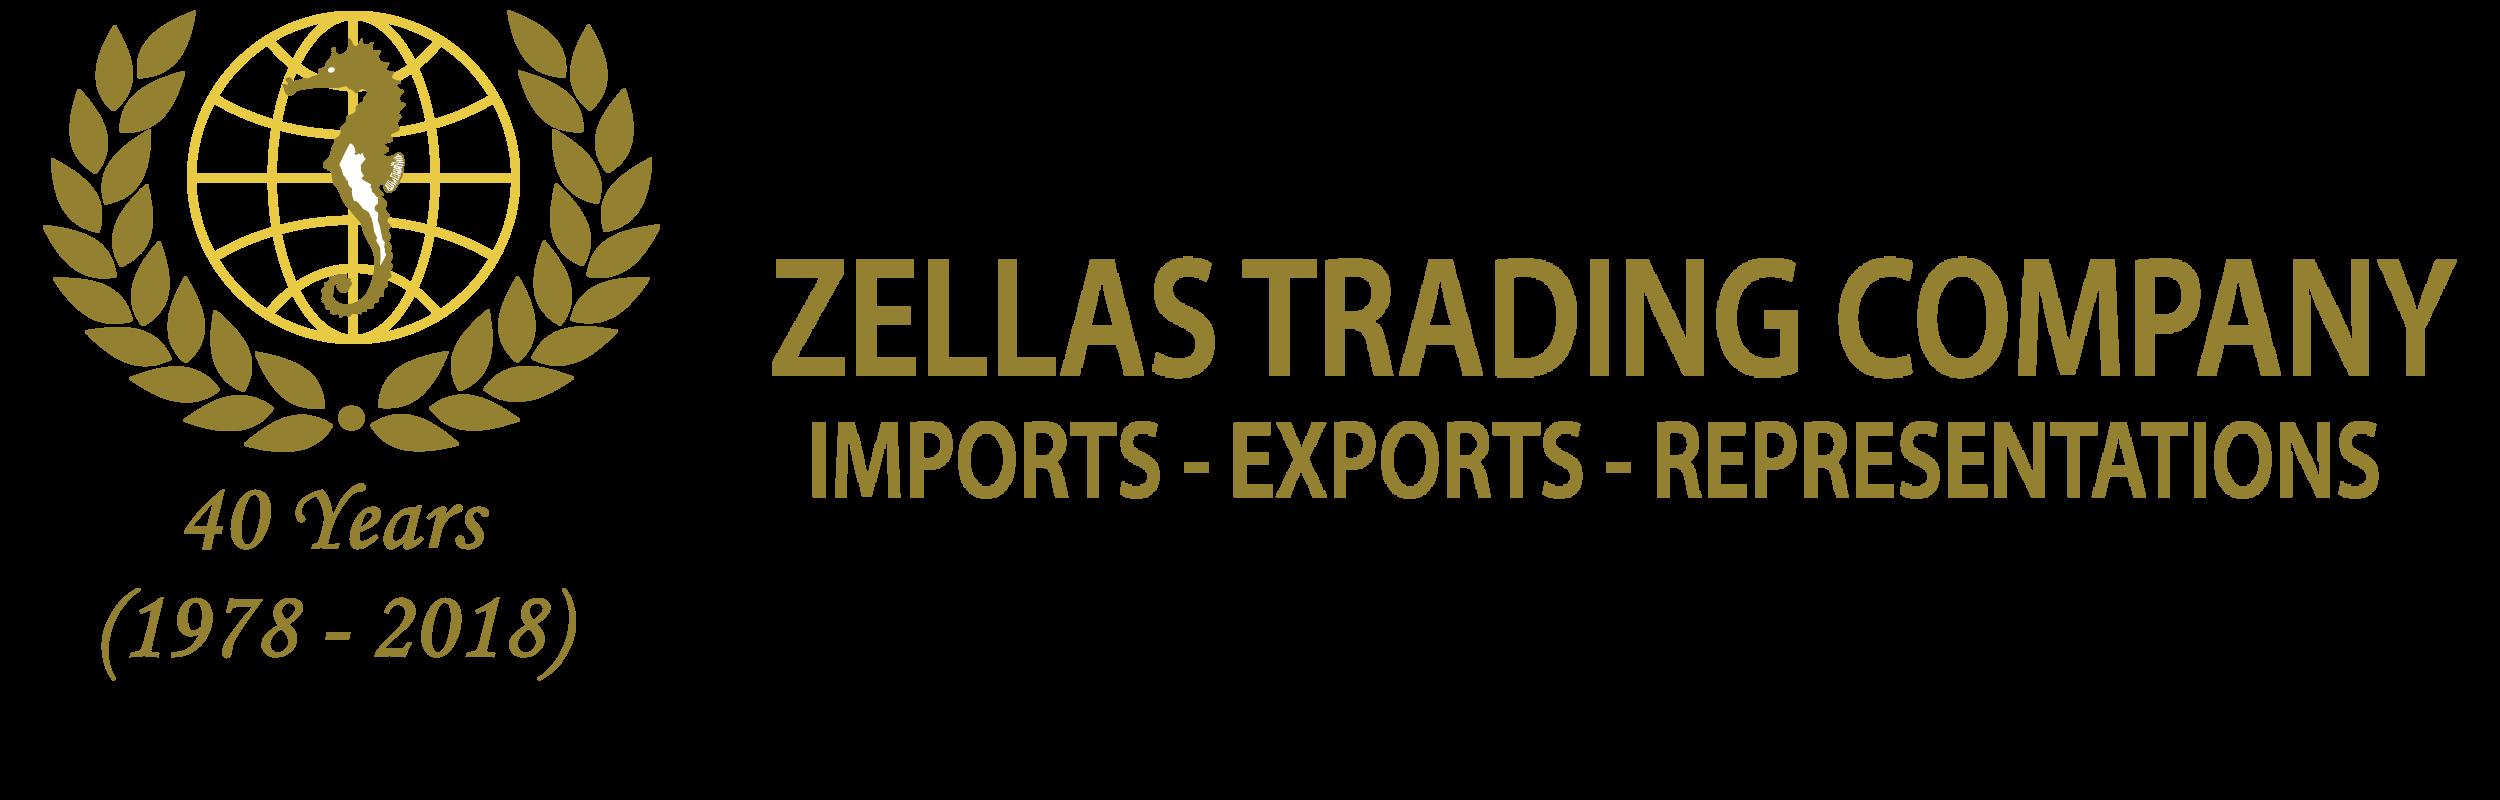 Zellas Trading Company